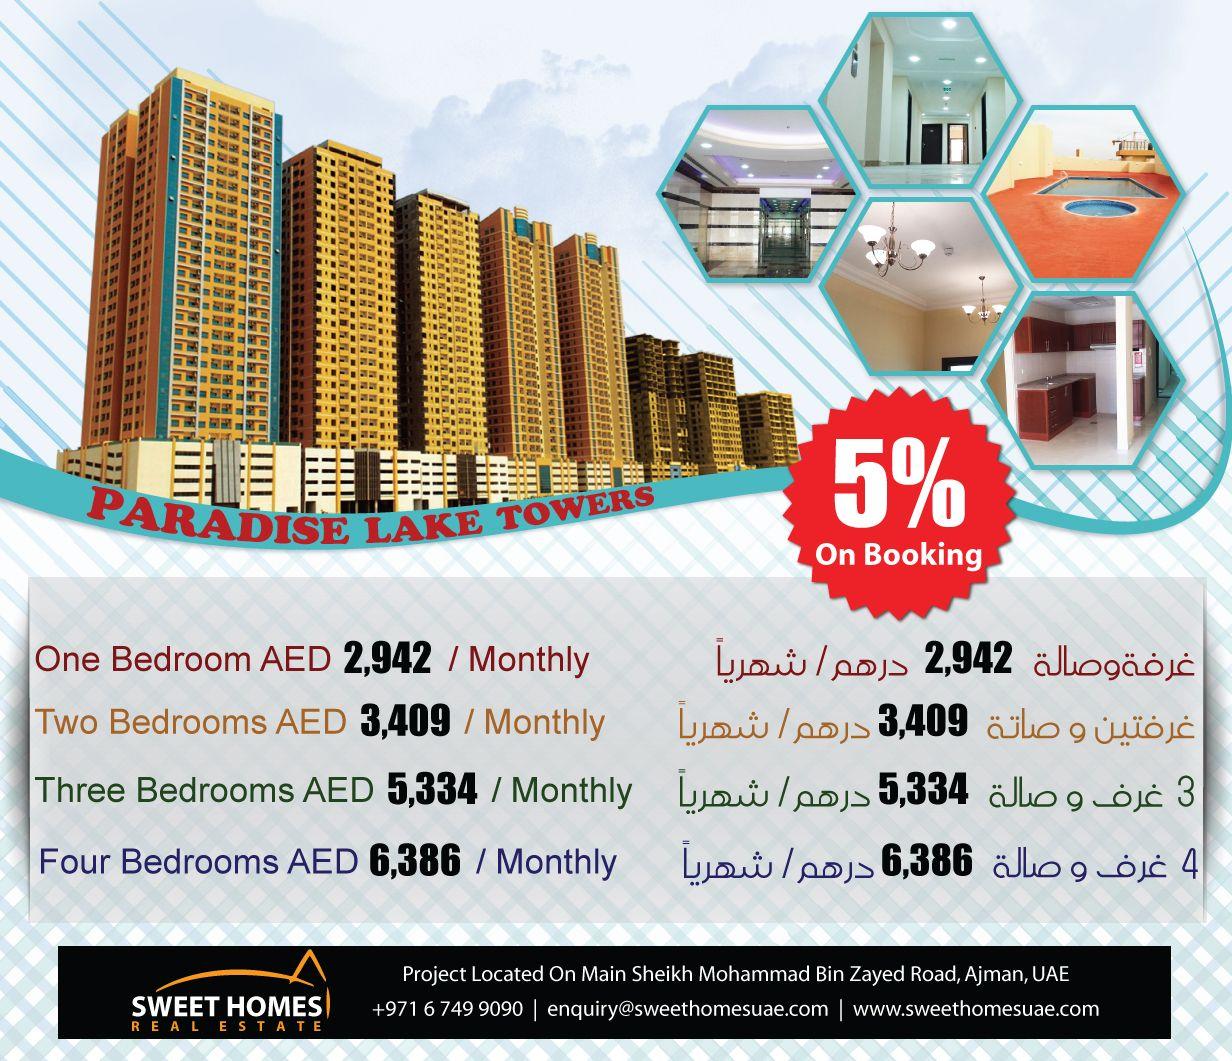 paradise Lakes Towers Apartments in dubai, Apartments